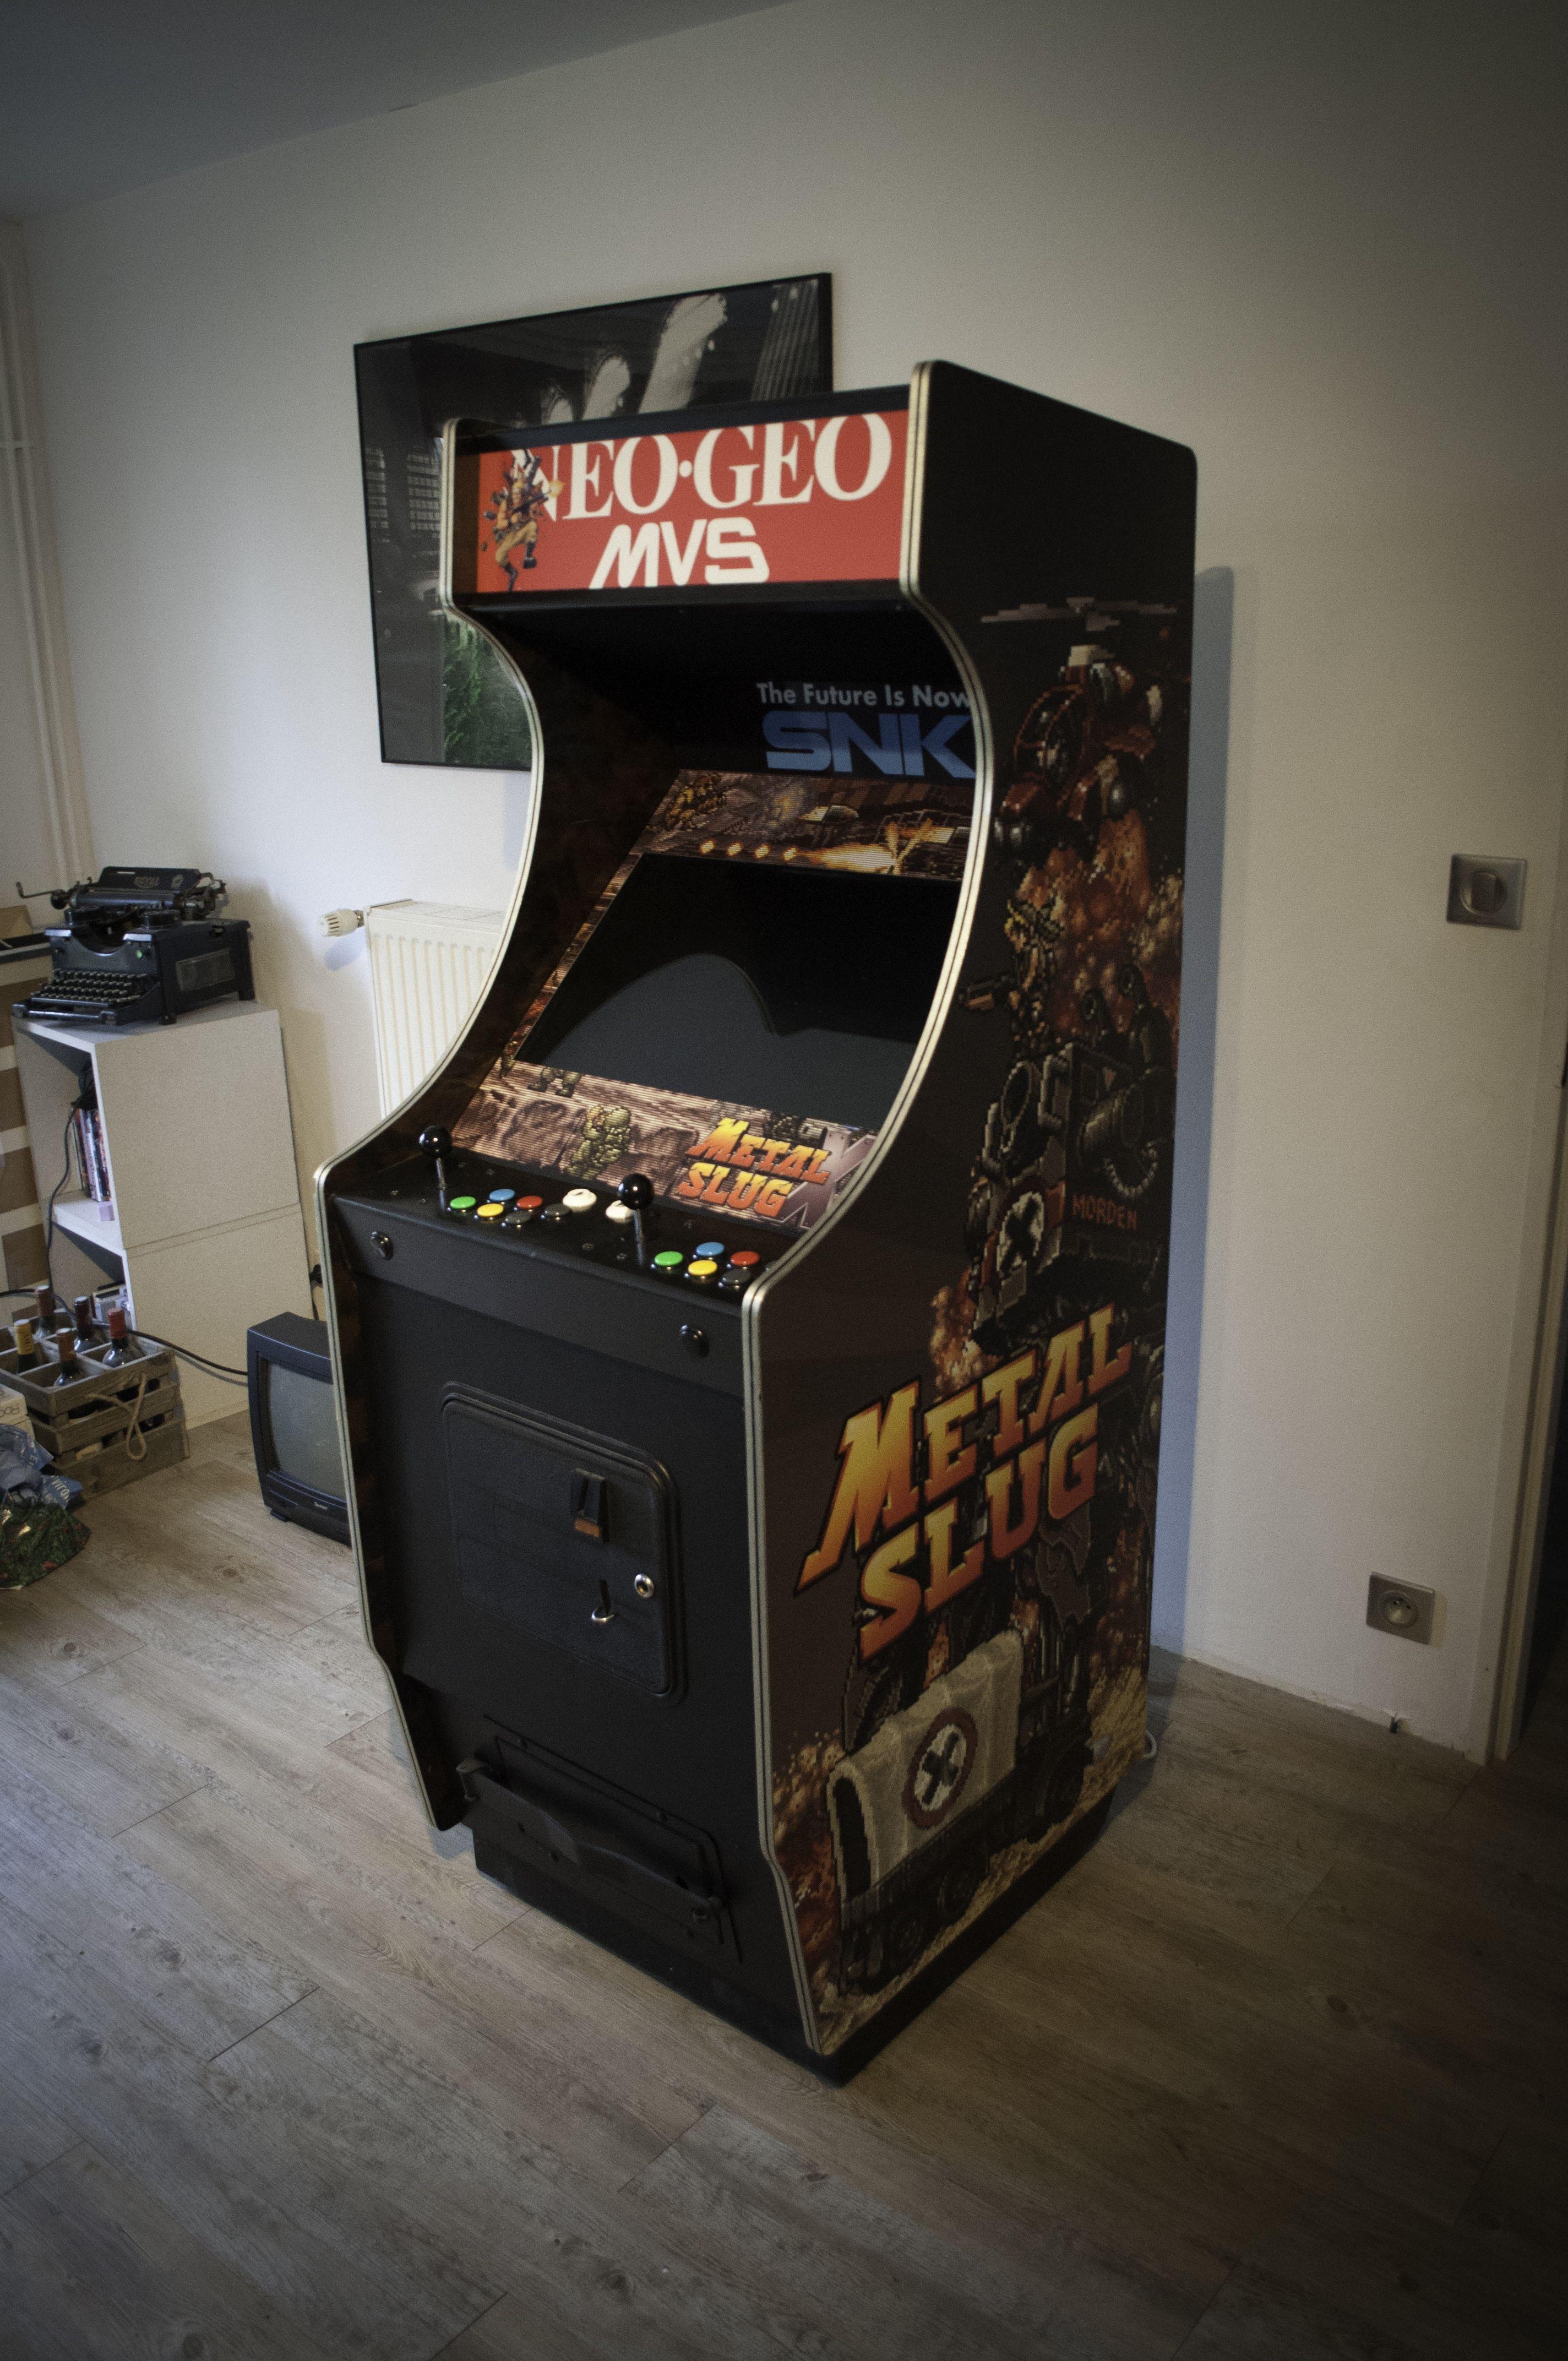 Borne D Arcade Metal Slug Neo Geo Videogames Cabinet Arcade Cabinet Arcade Machine Arcade